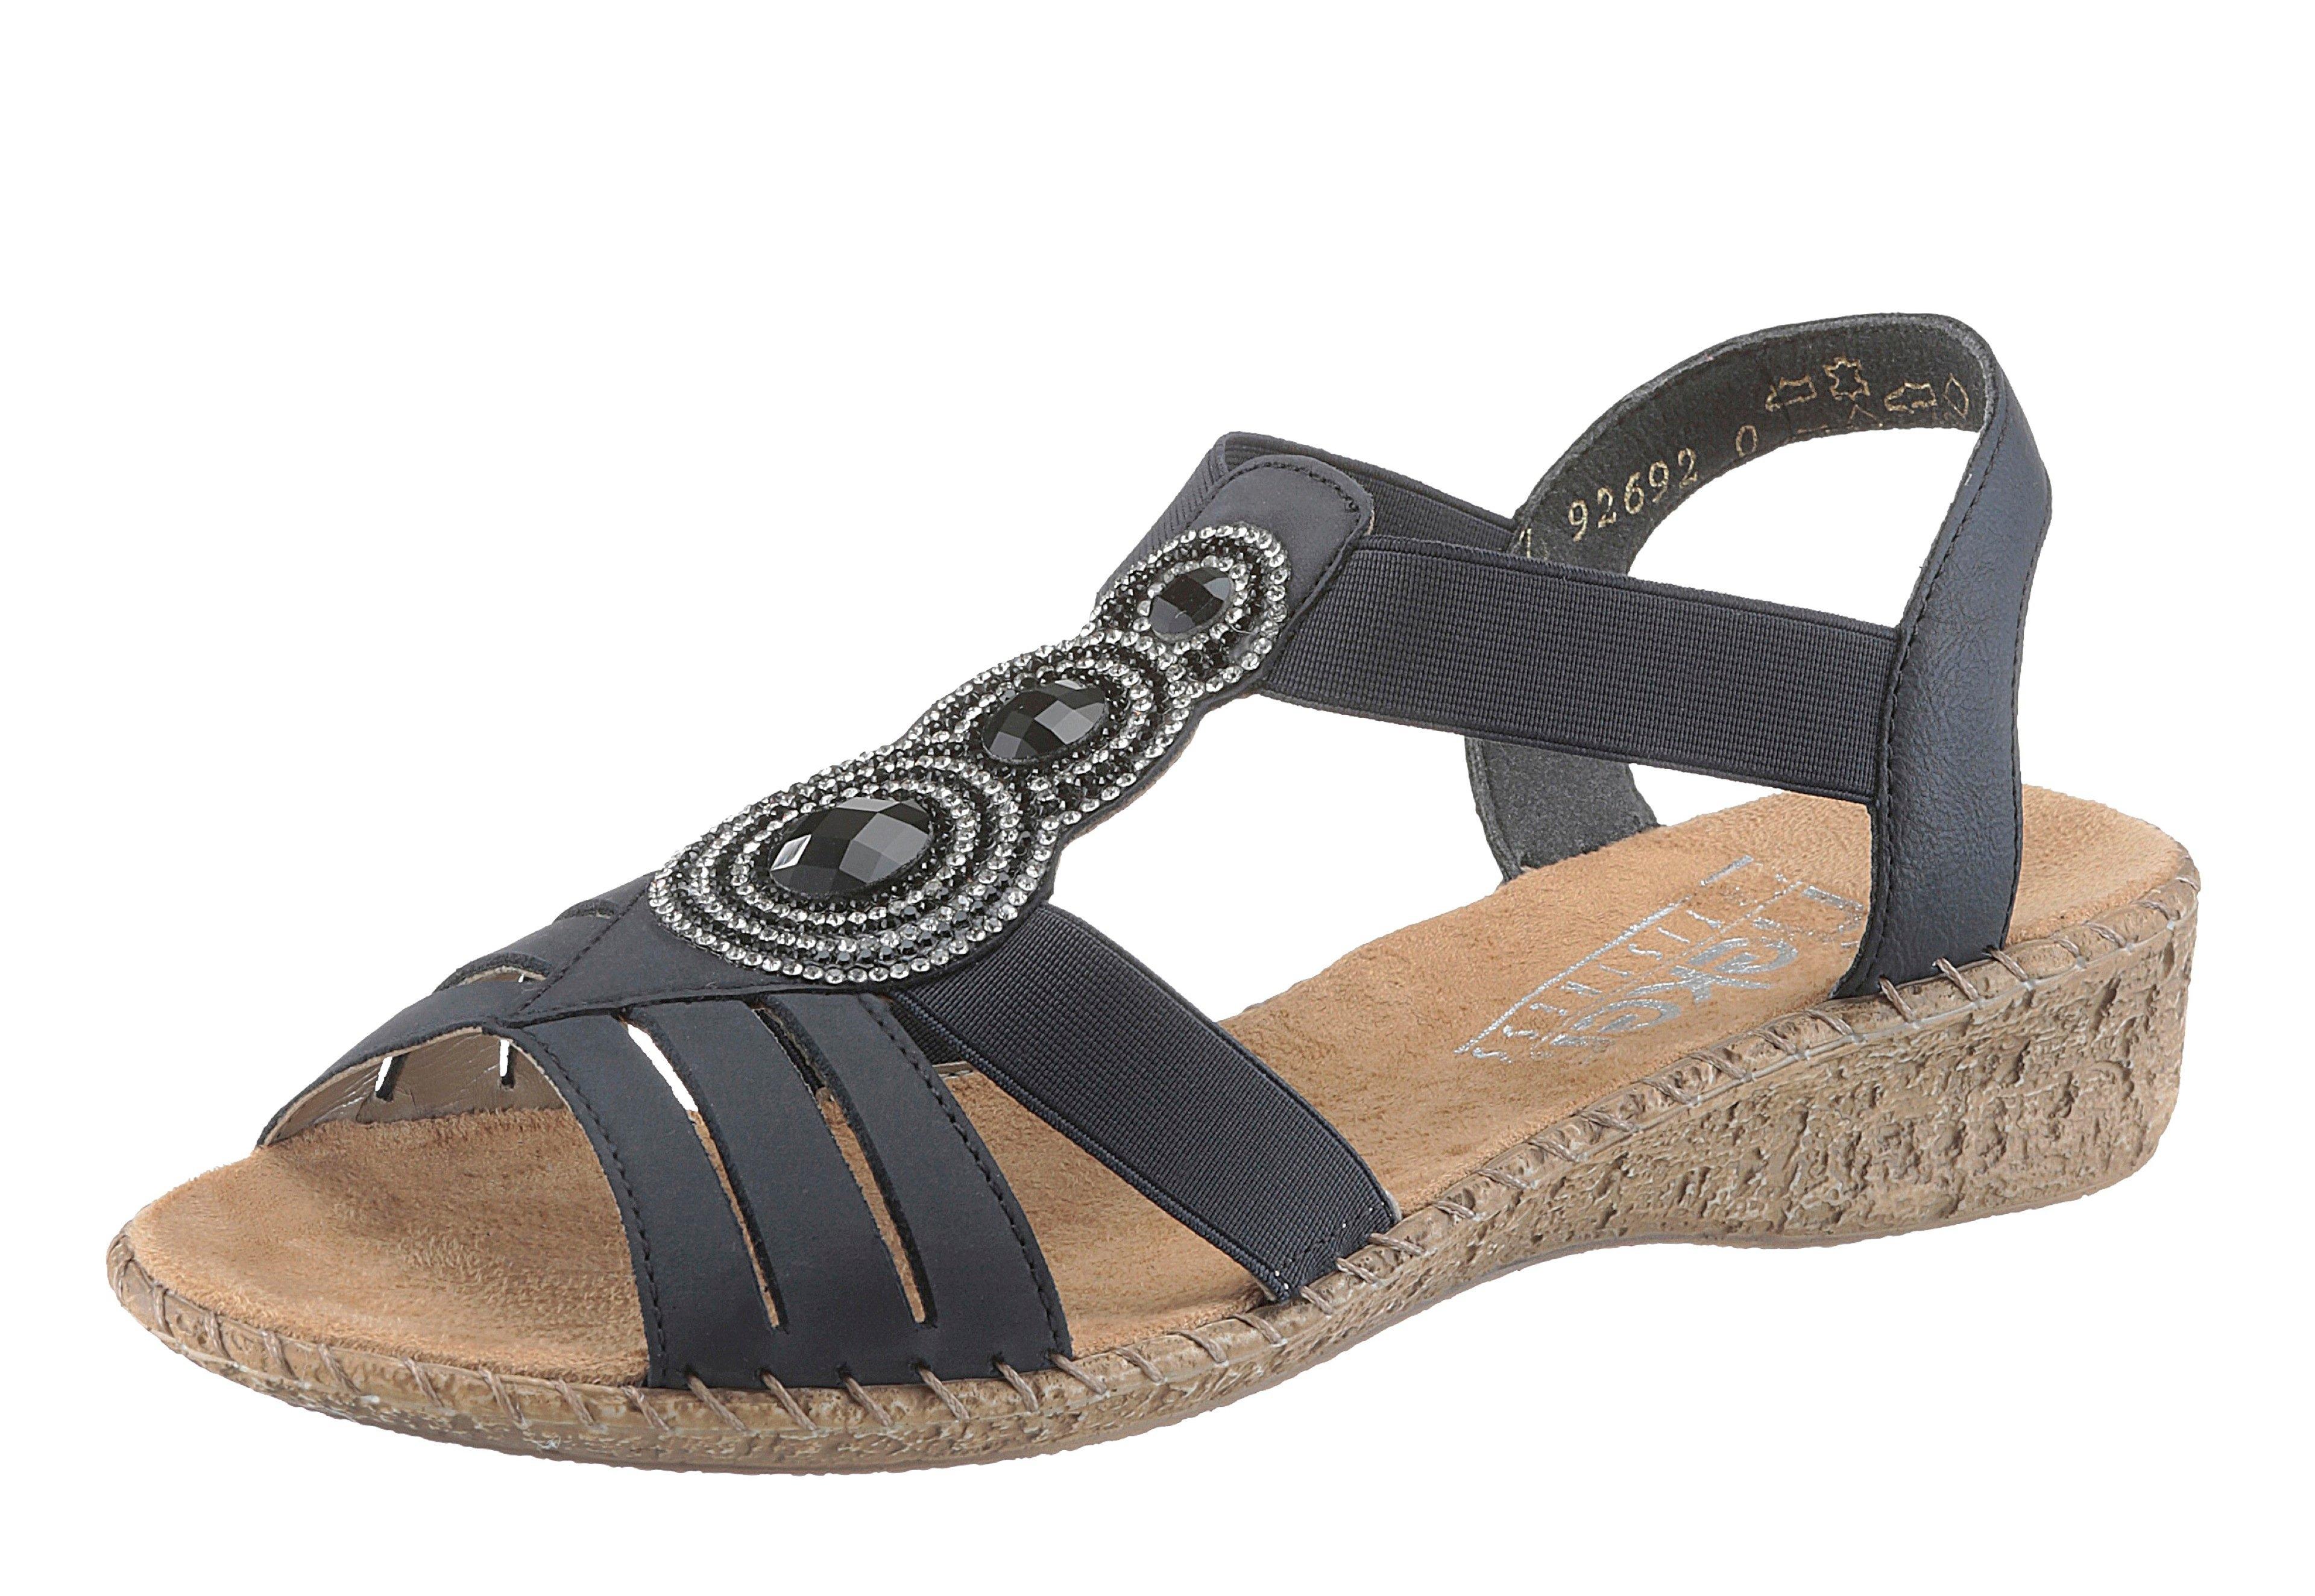 rieker sandalen bestel nu bij otto. Black Bedroom Furniture Sets. Home Design Ideas